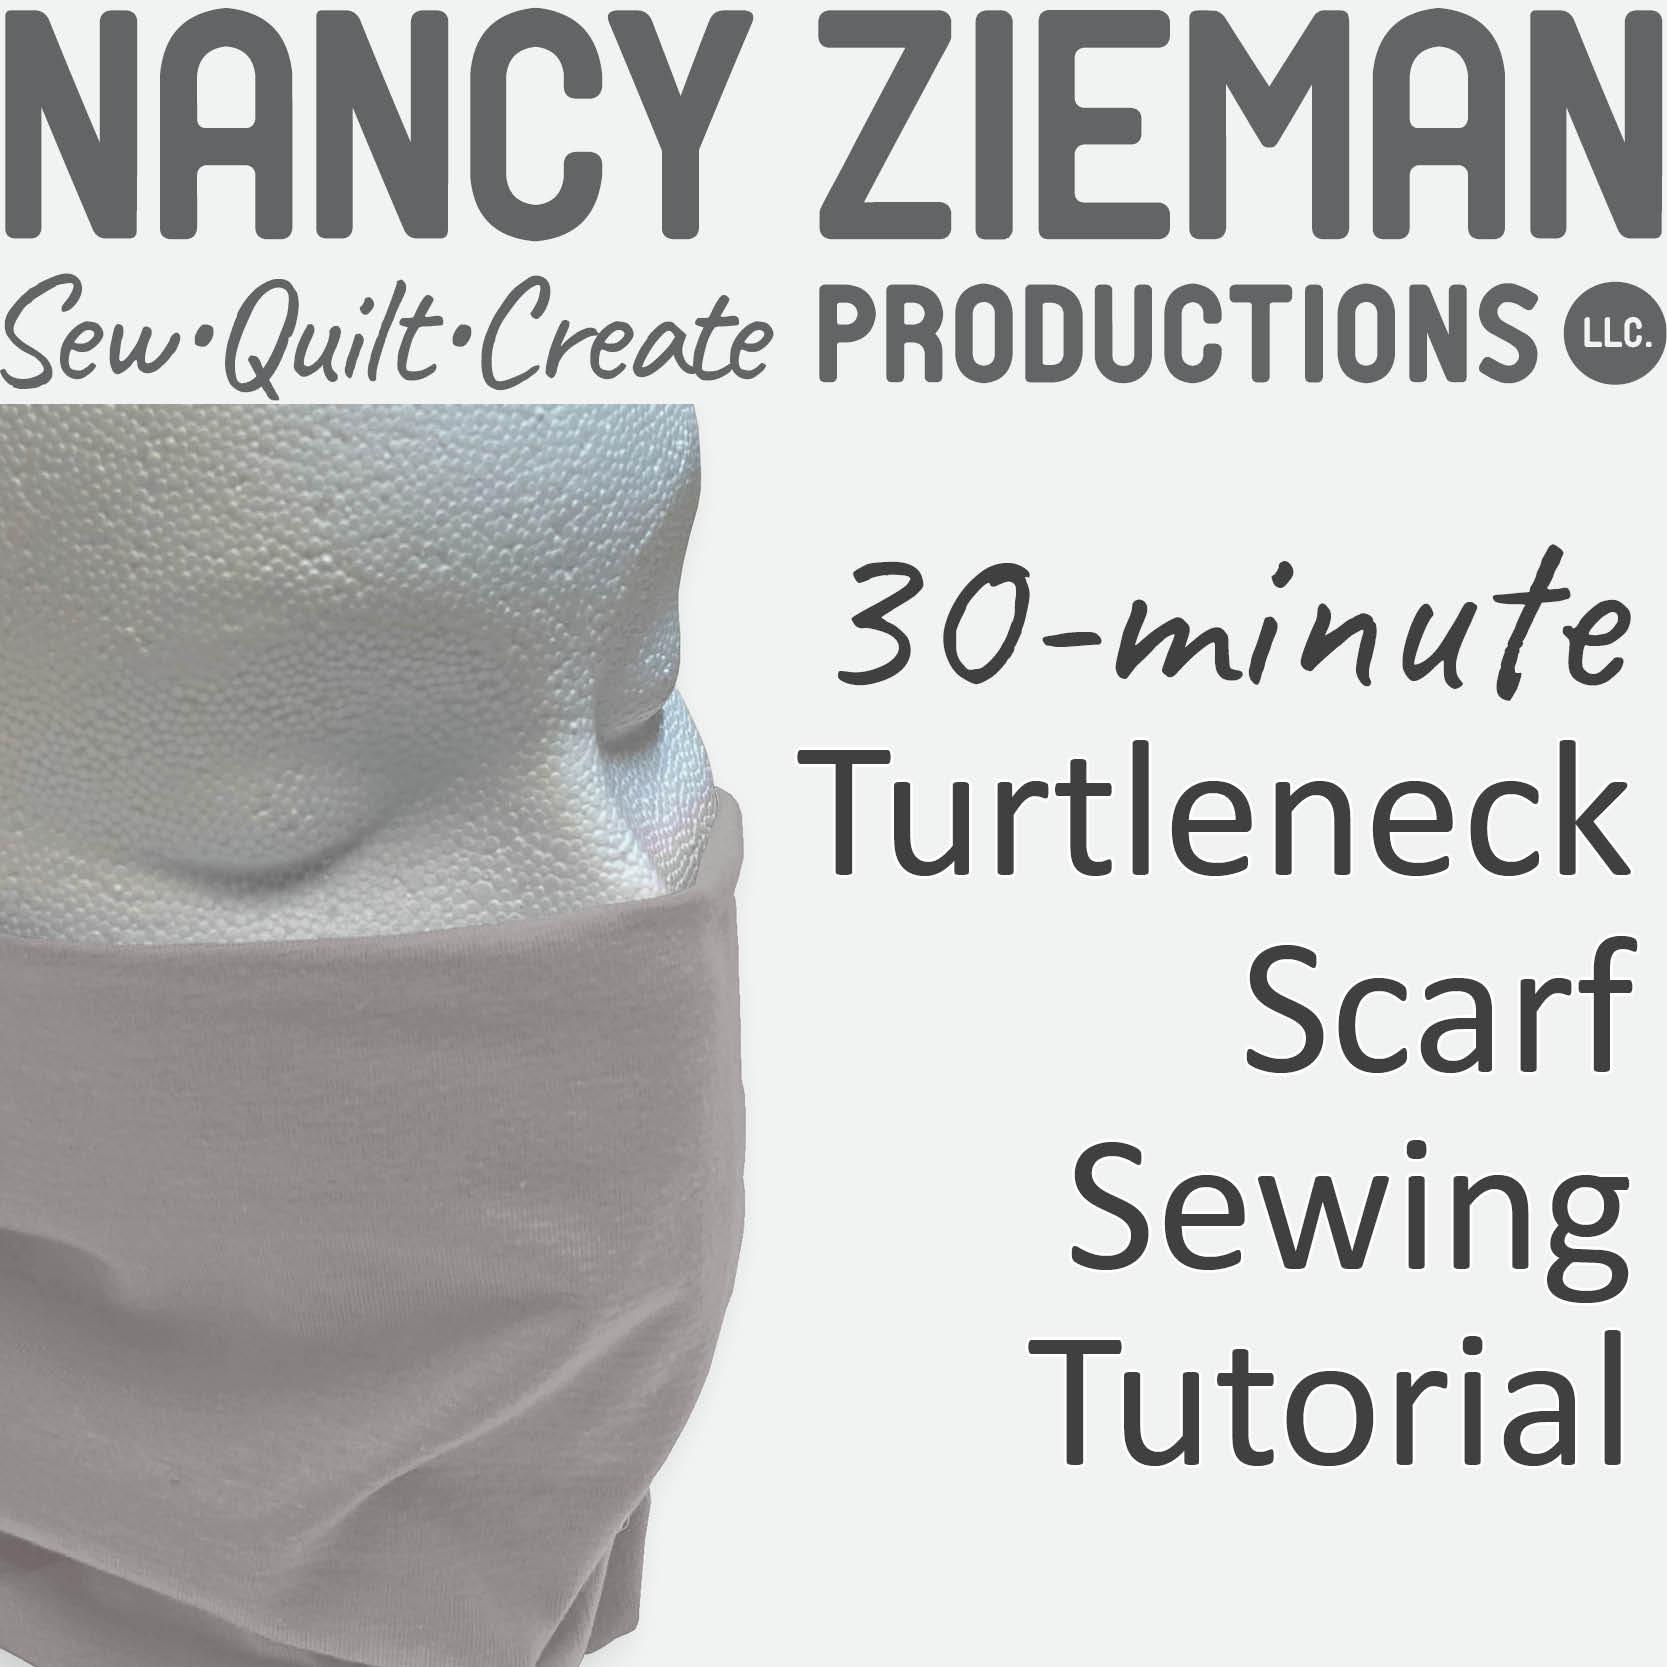 Turtleneck Scarf Sewing Tutorial by Nancy Zieman Productions at the NZP Blog at nancyzieman.com/blog